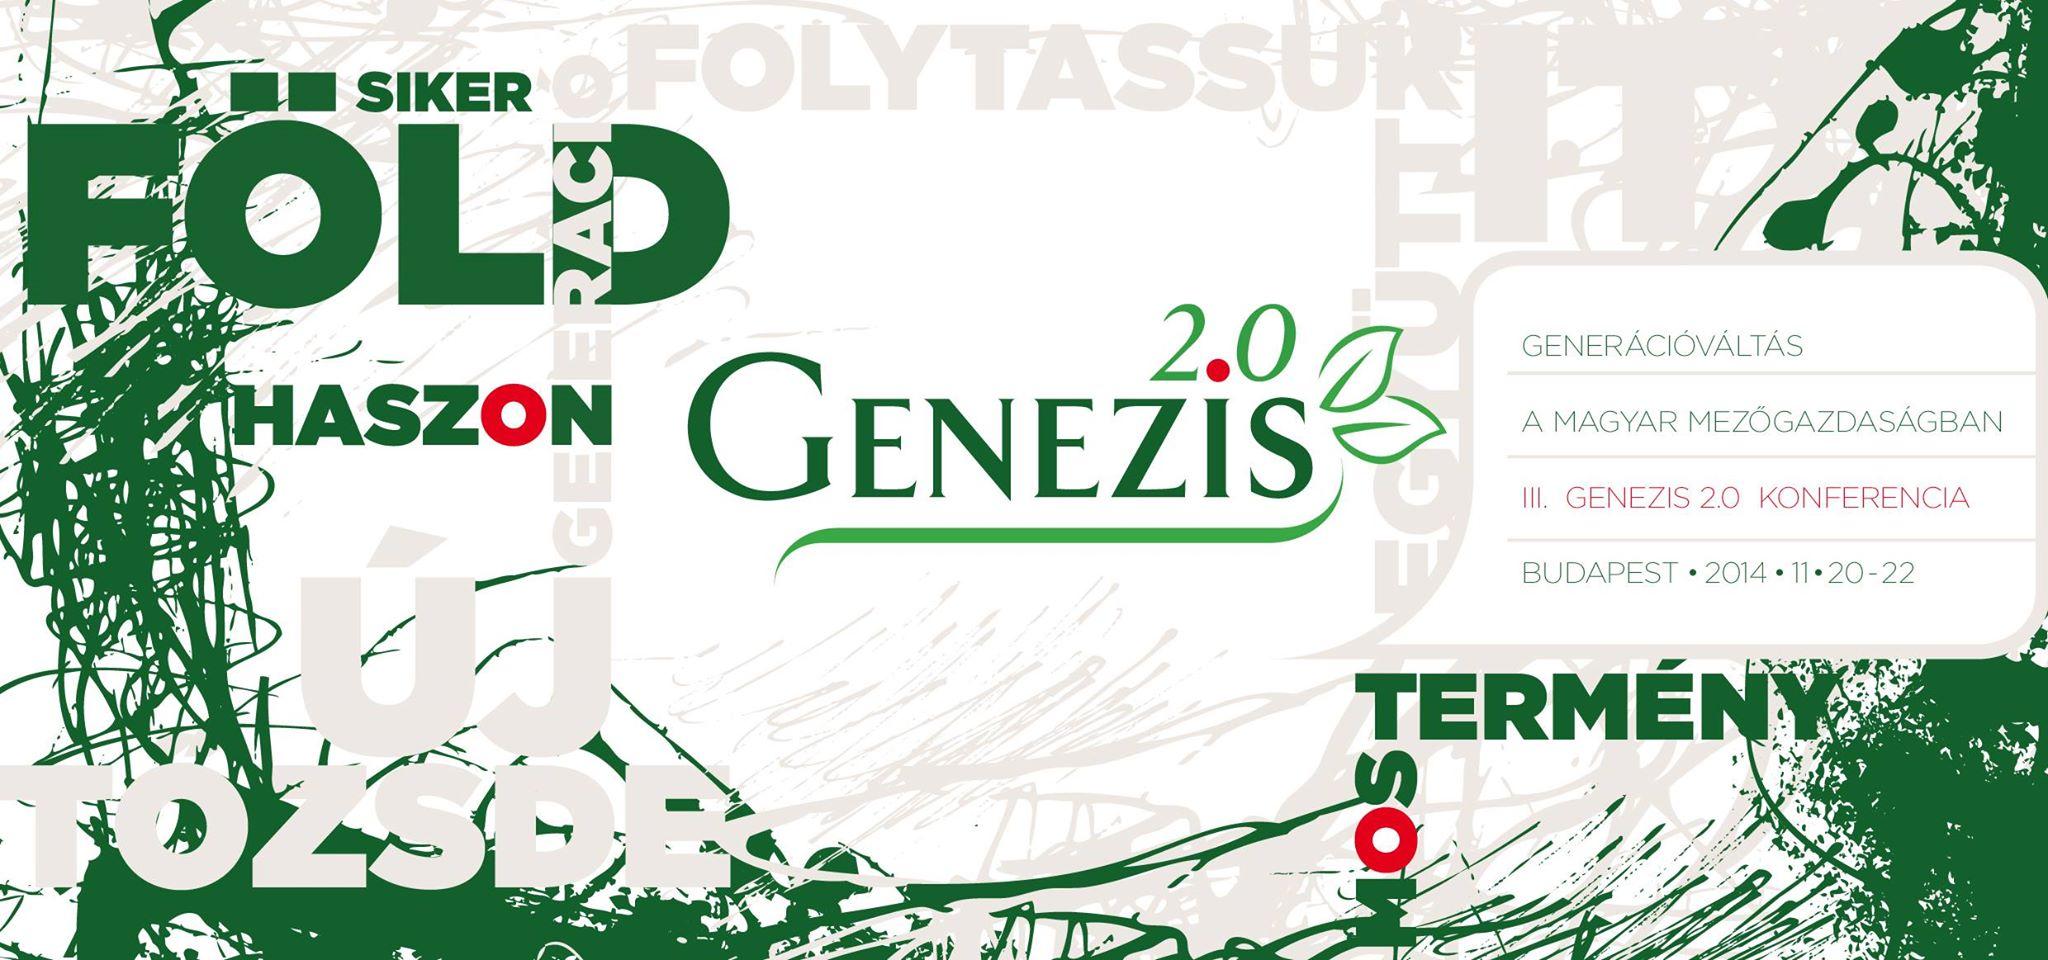 genezis2.0